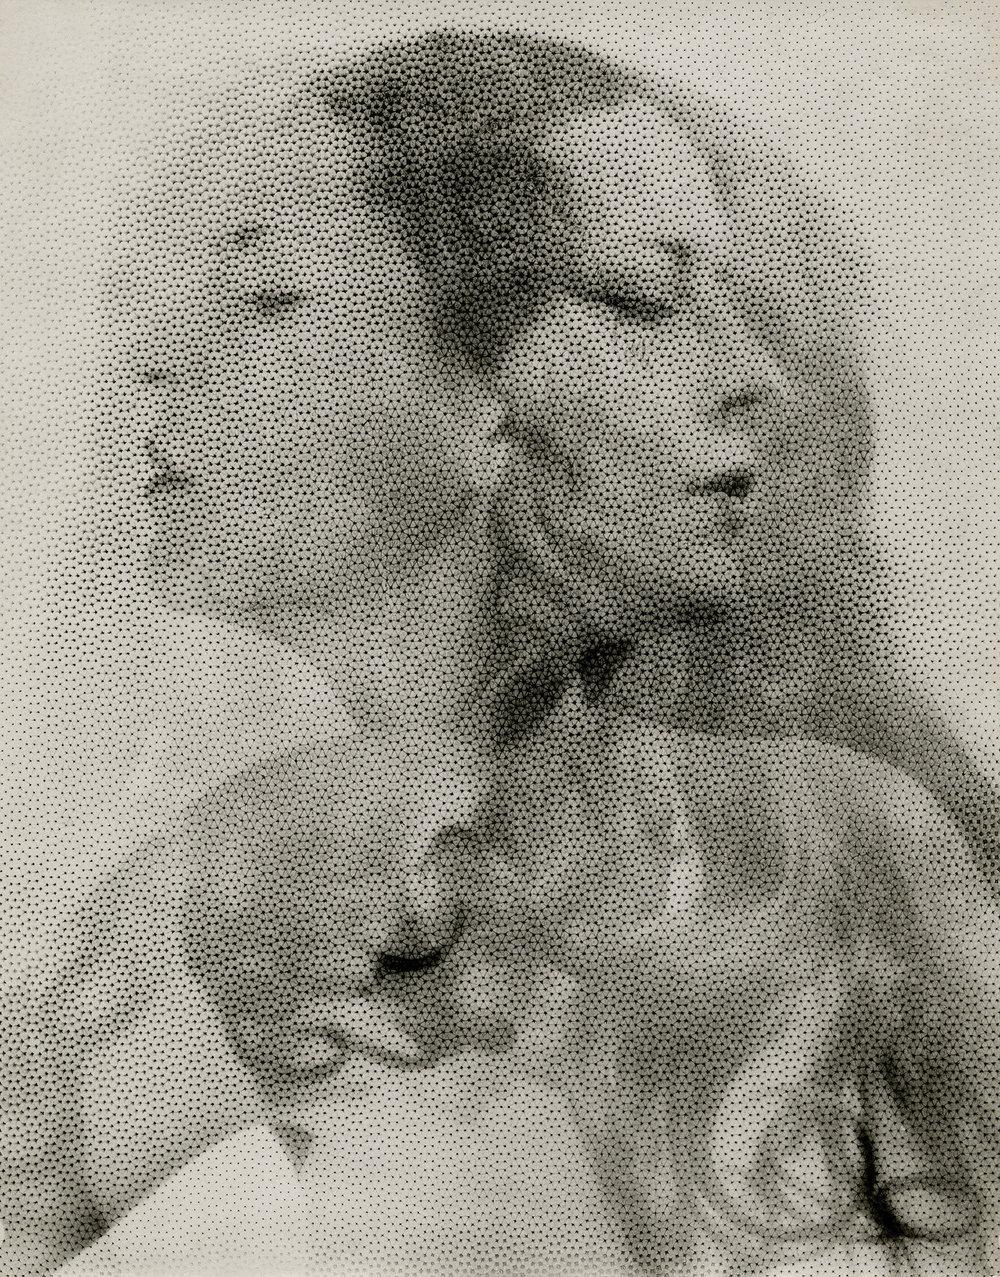 © Francois Kollar, Untitled, 1933